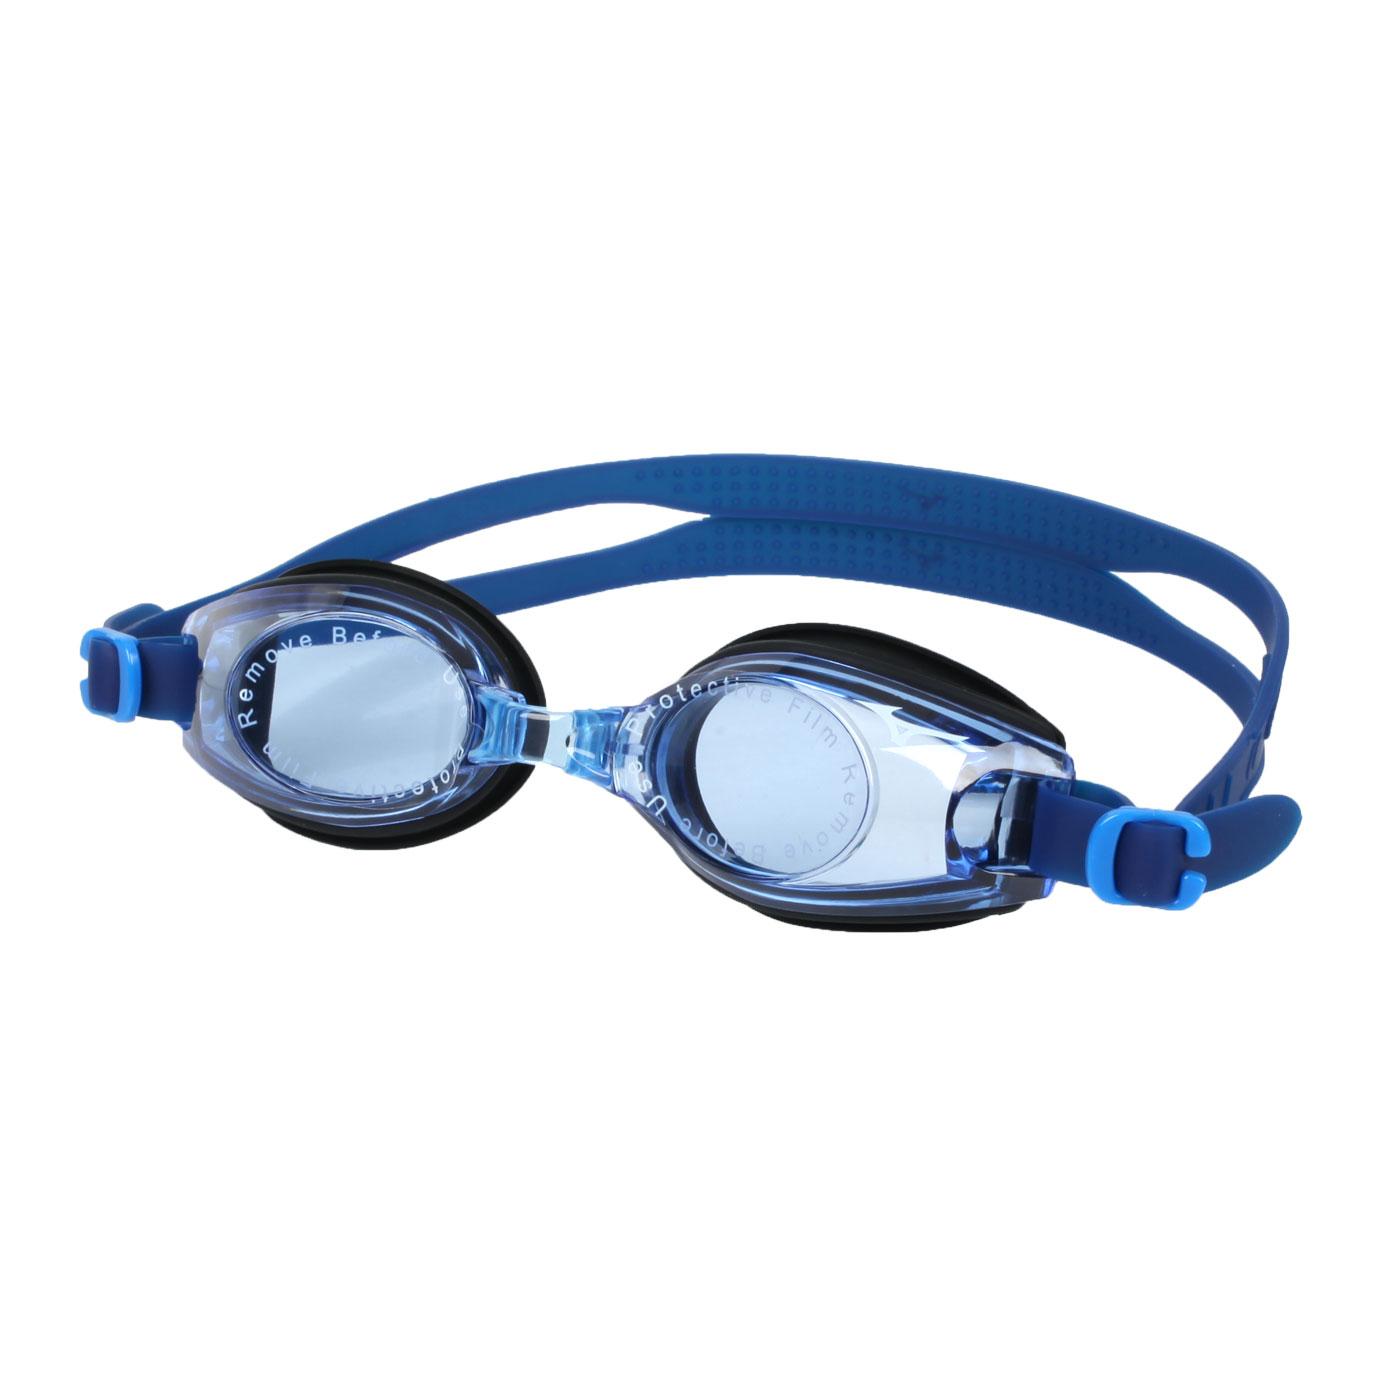 MIZUNO 兒童泳鏡  SWIMN3TF059500-09 - 藍黑